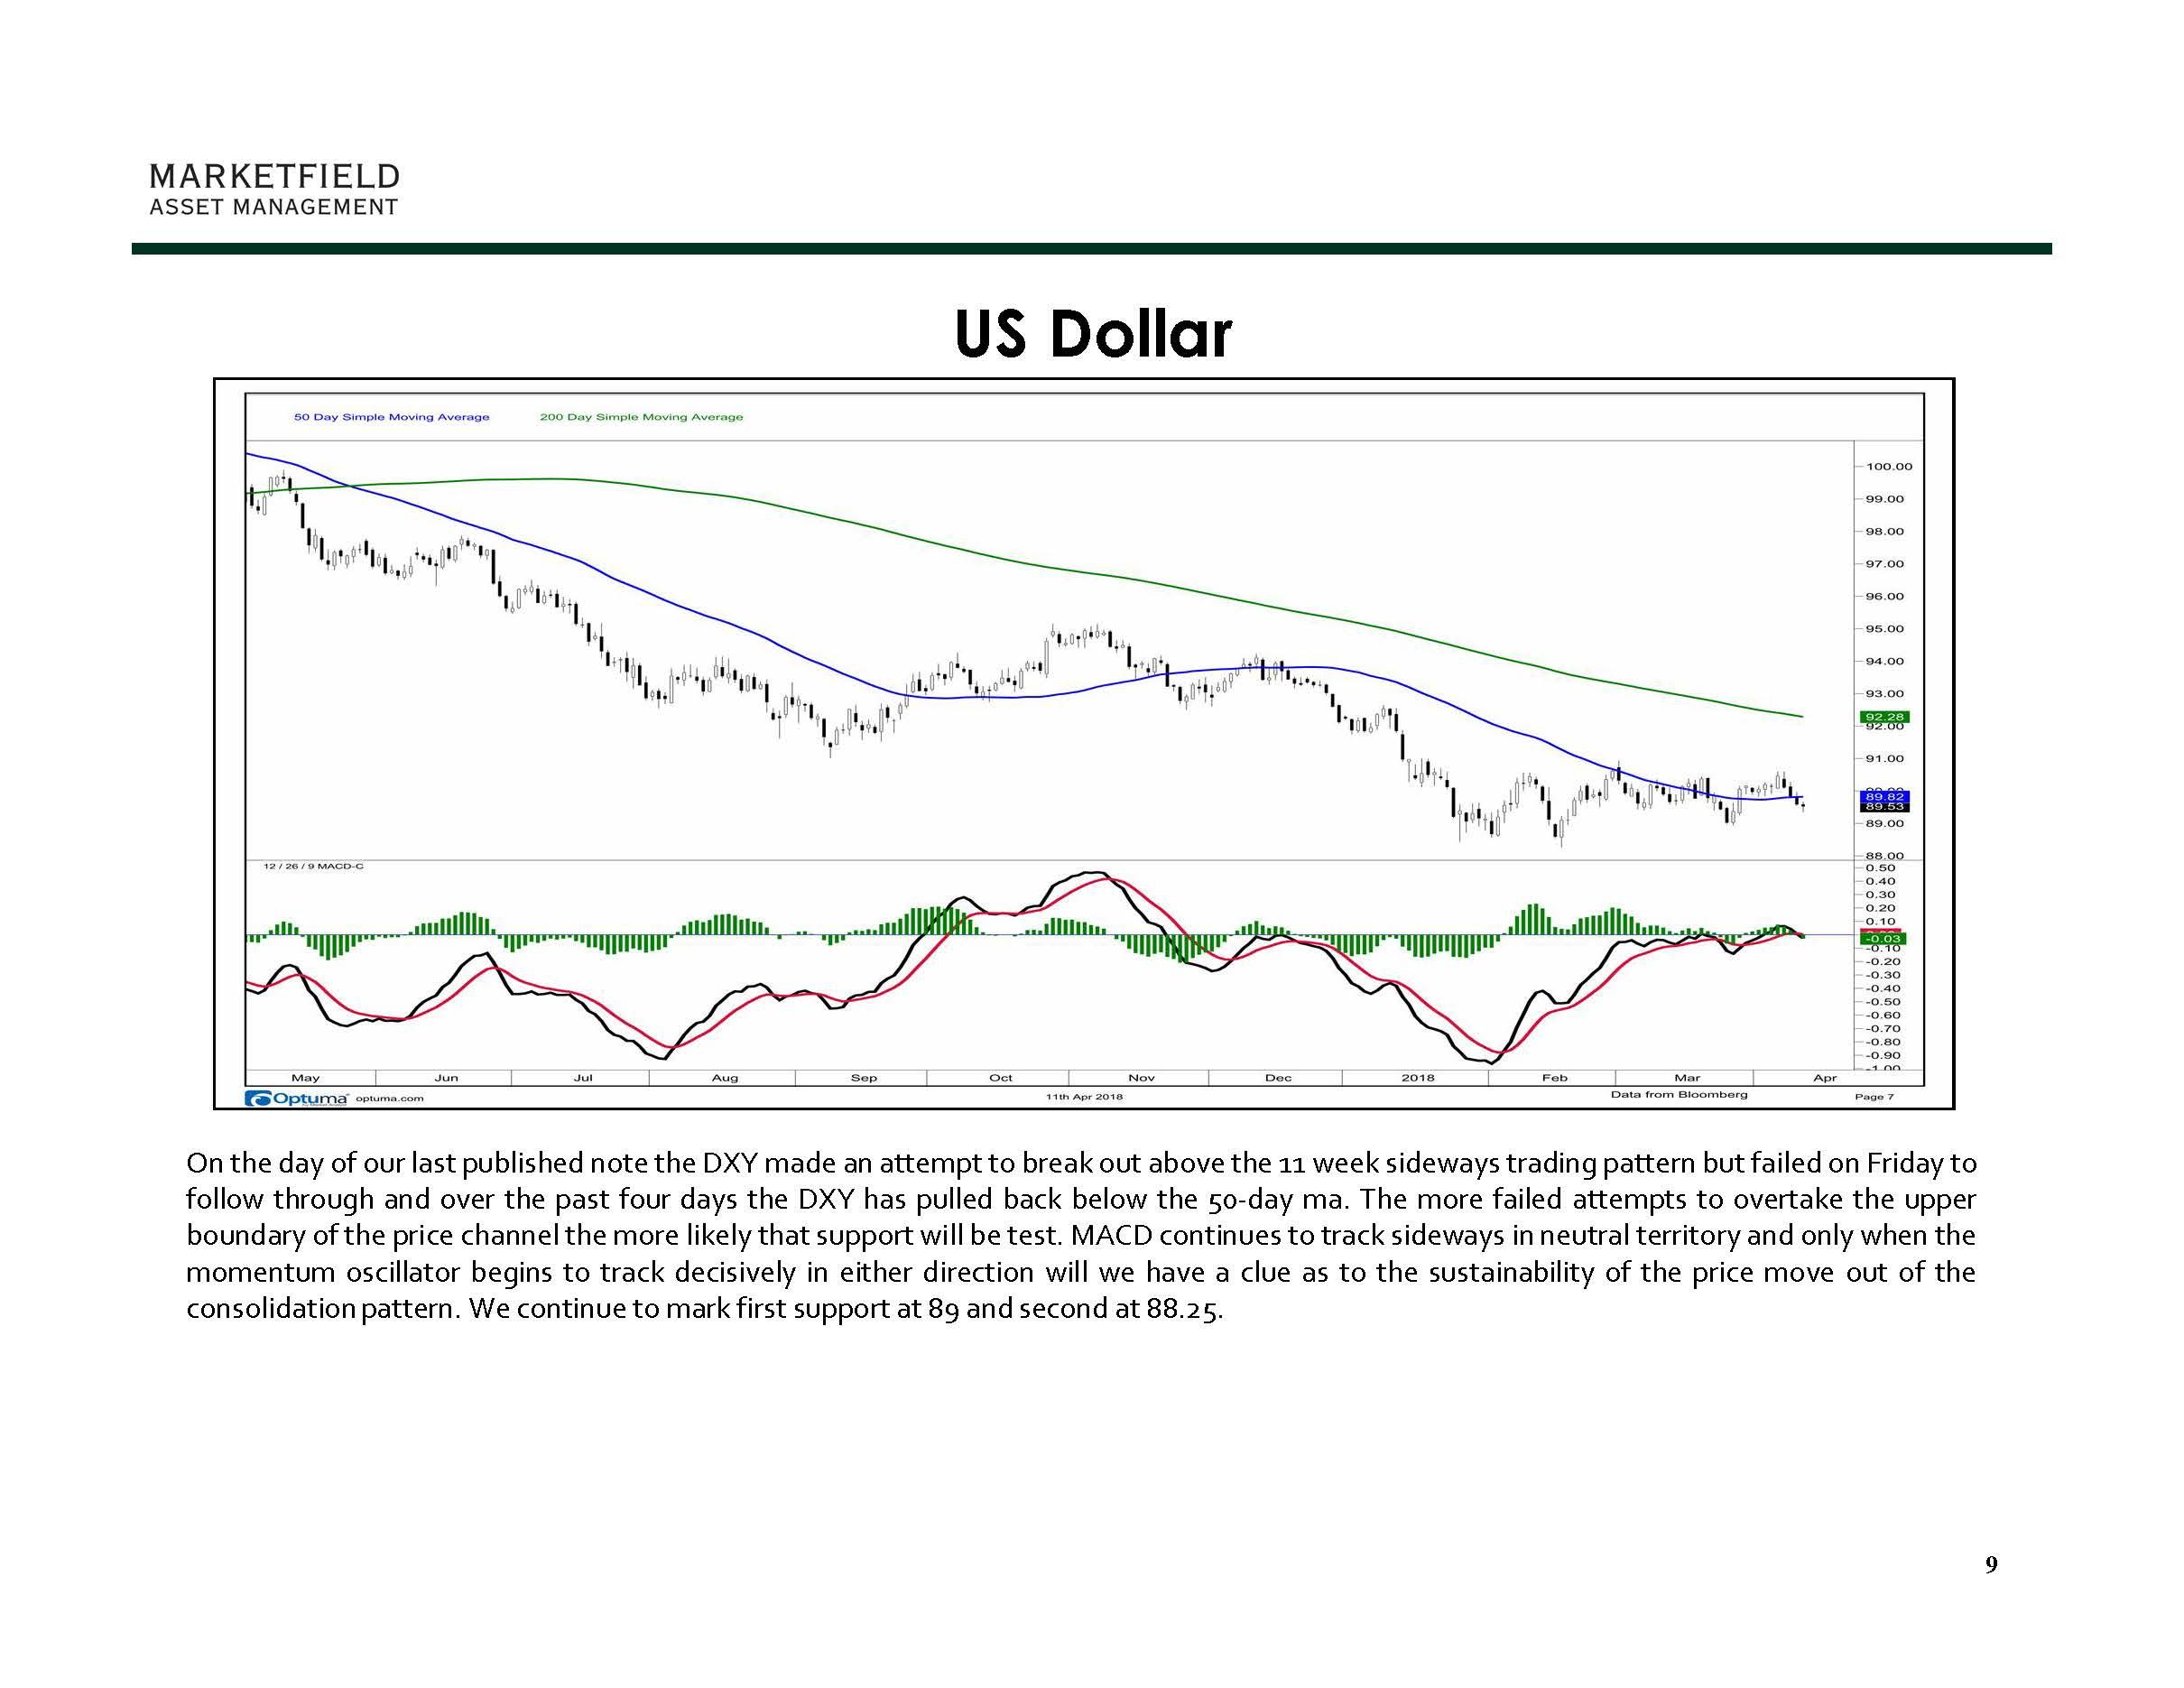 April 12_Marketfield Weekly Speculator_Page_10.jpg